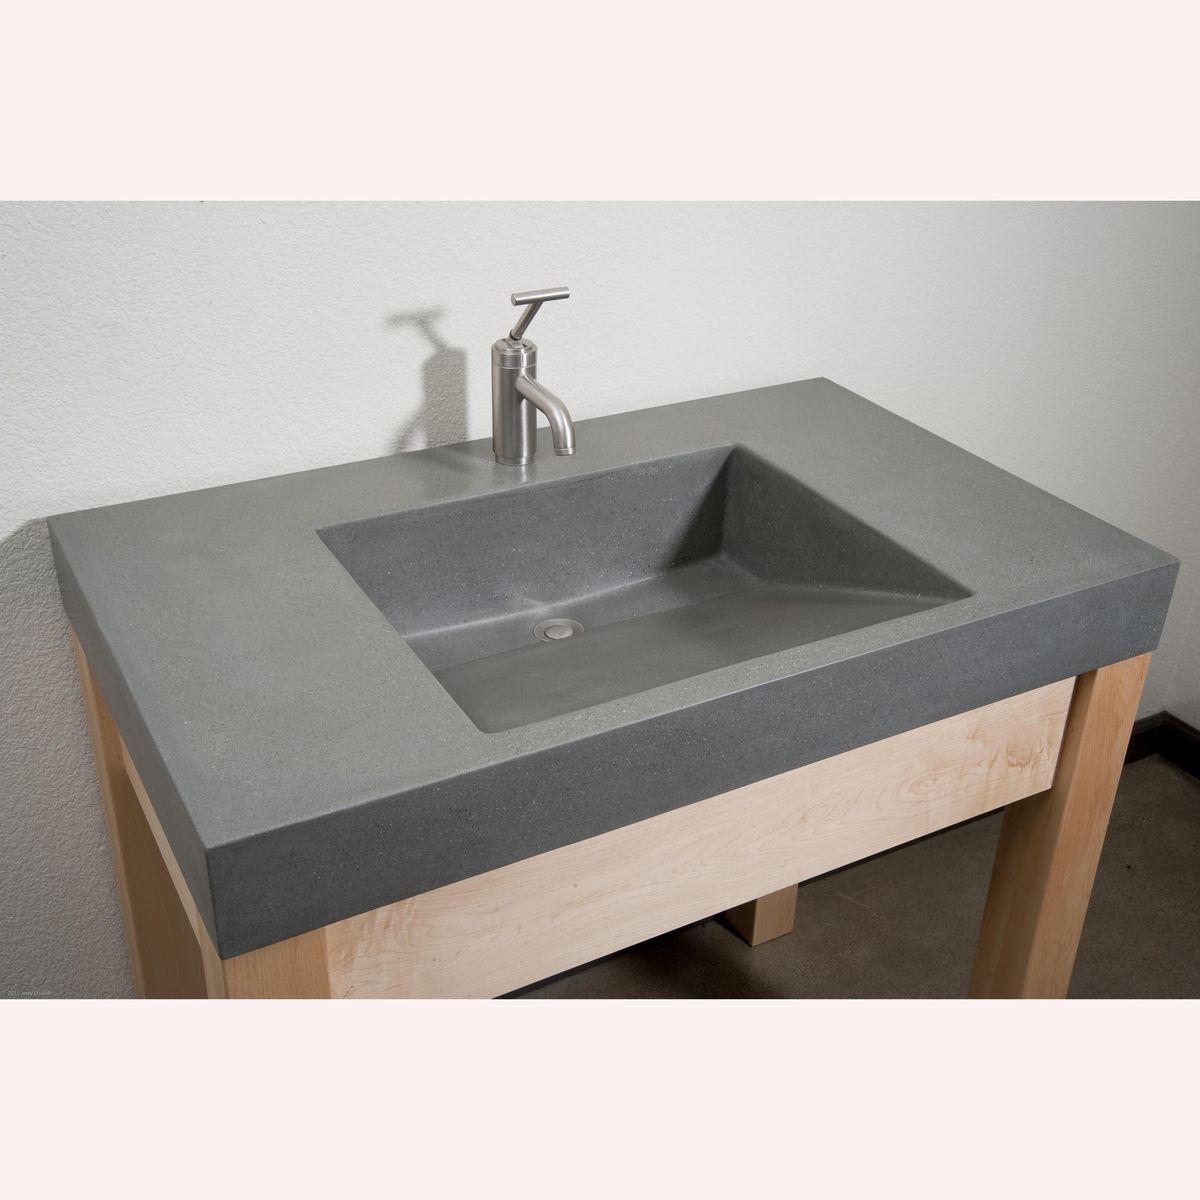 Handmade Portland Grey Ramp Sink Concrete Vanity With Maple Stand by Bohemian Stoneworks